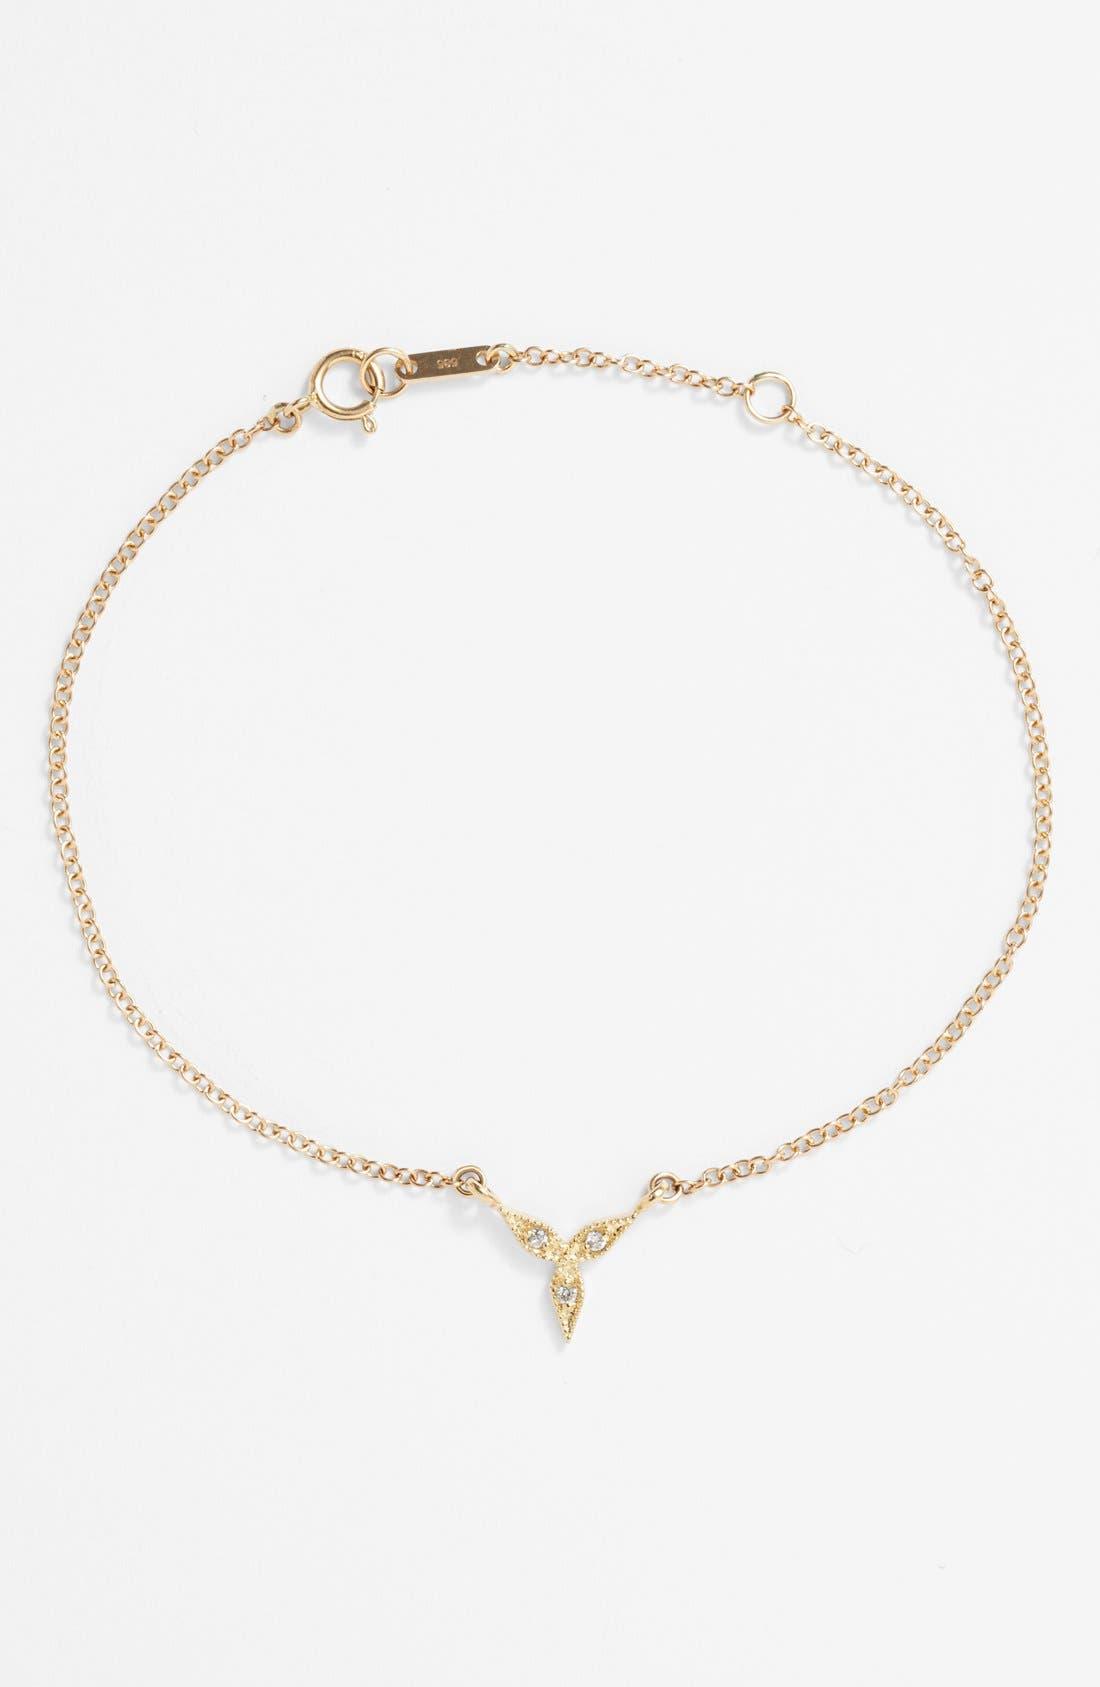 Alternate Image 1 Selected - Mizuki 'Sea of Beauty' Diamond Station Bracelet